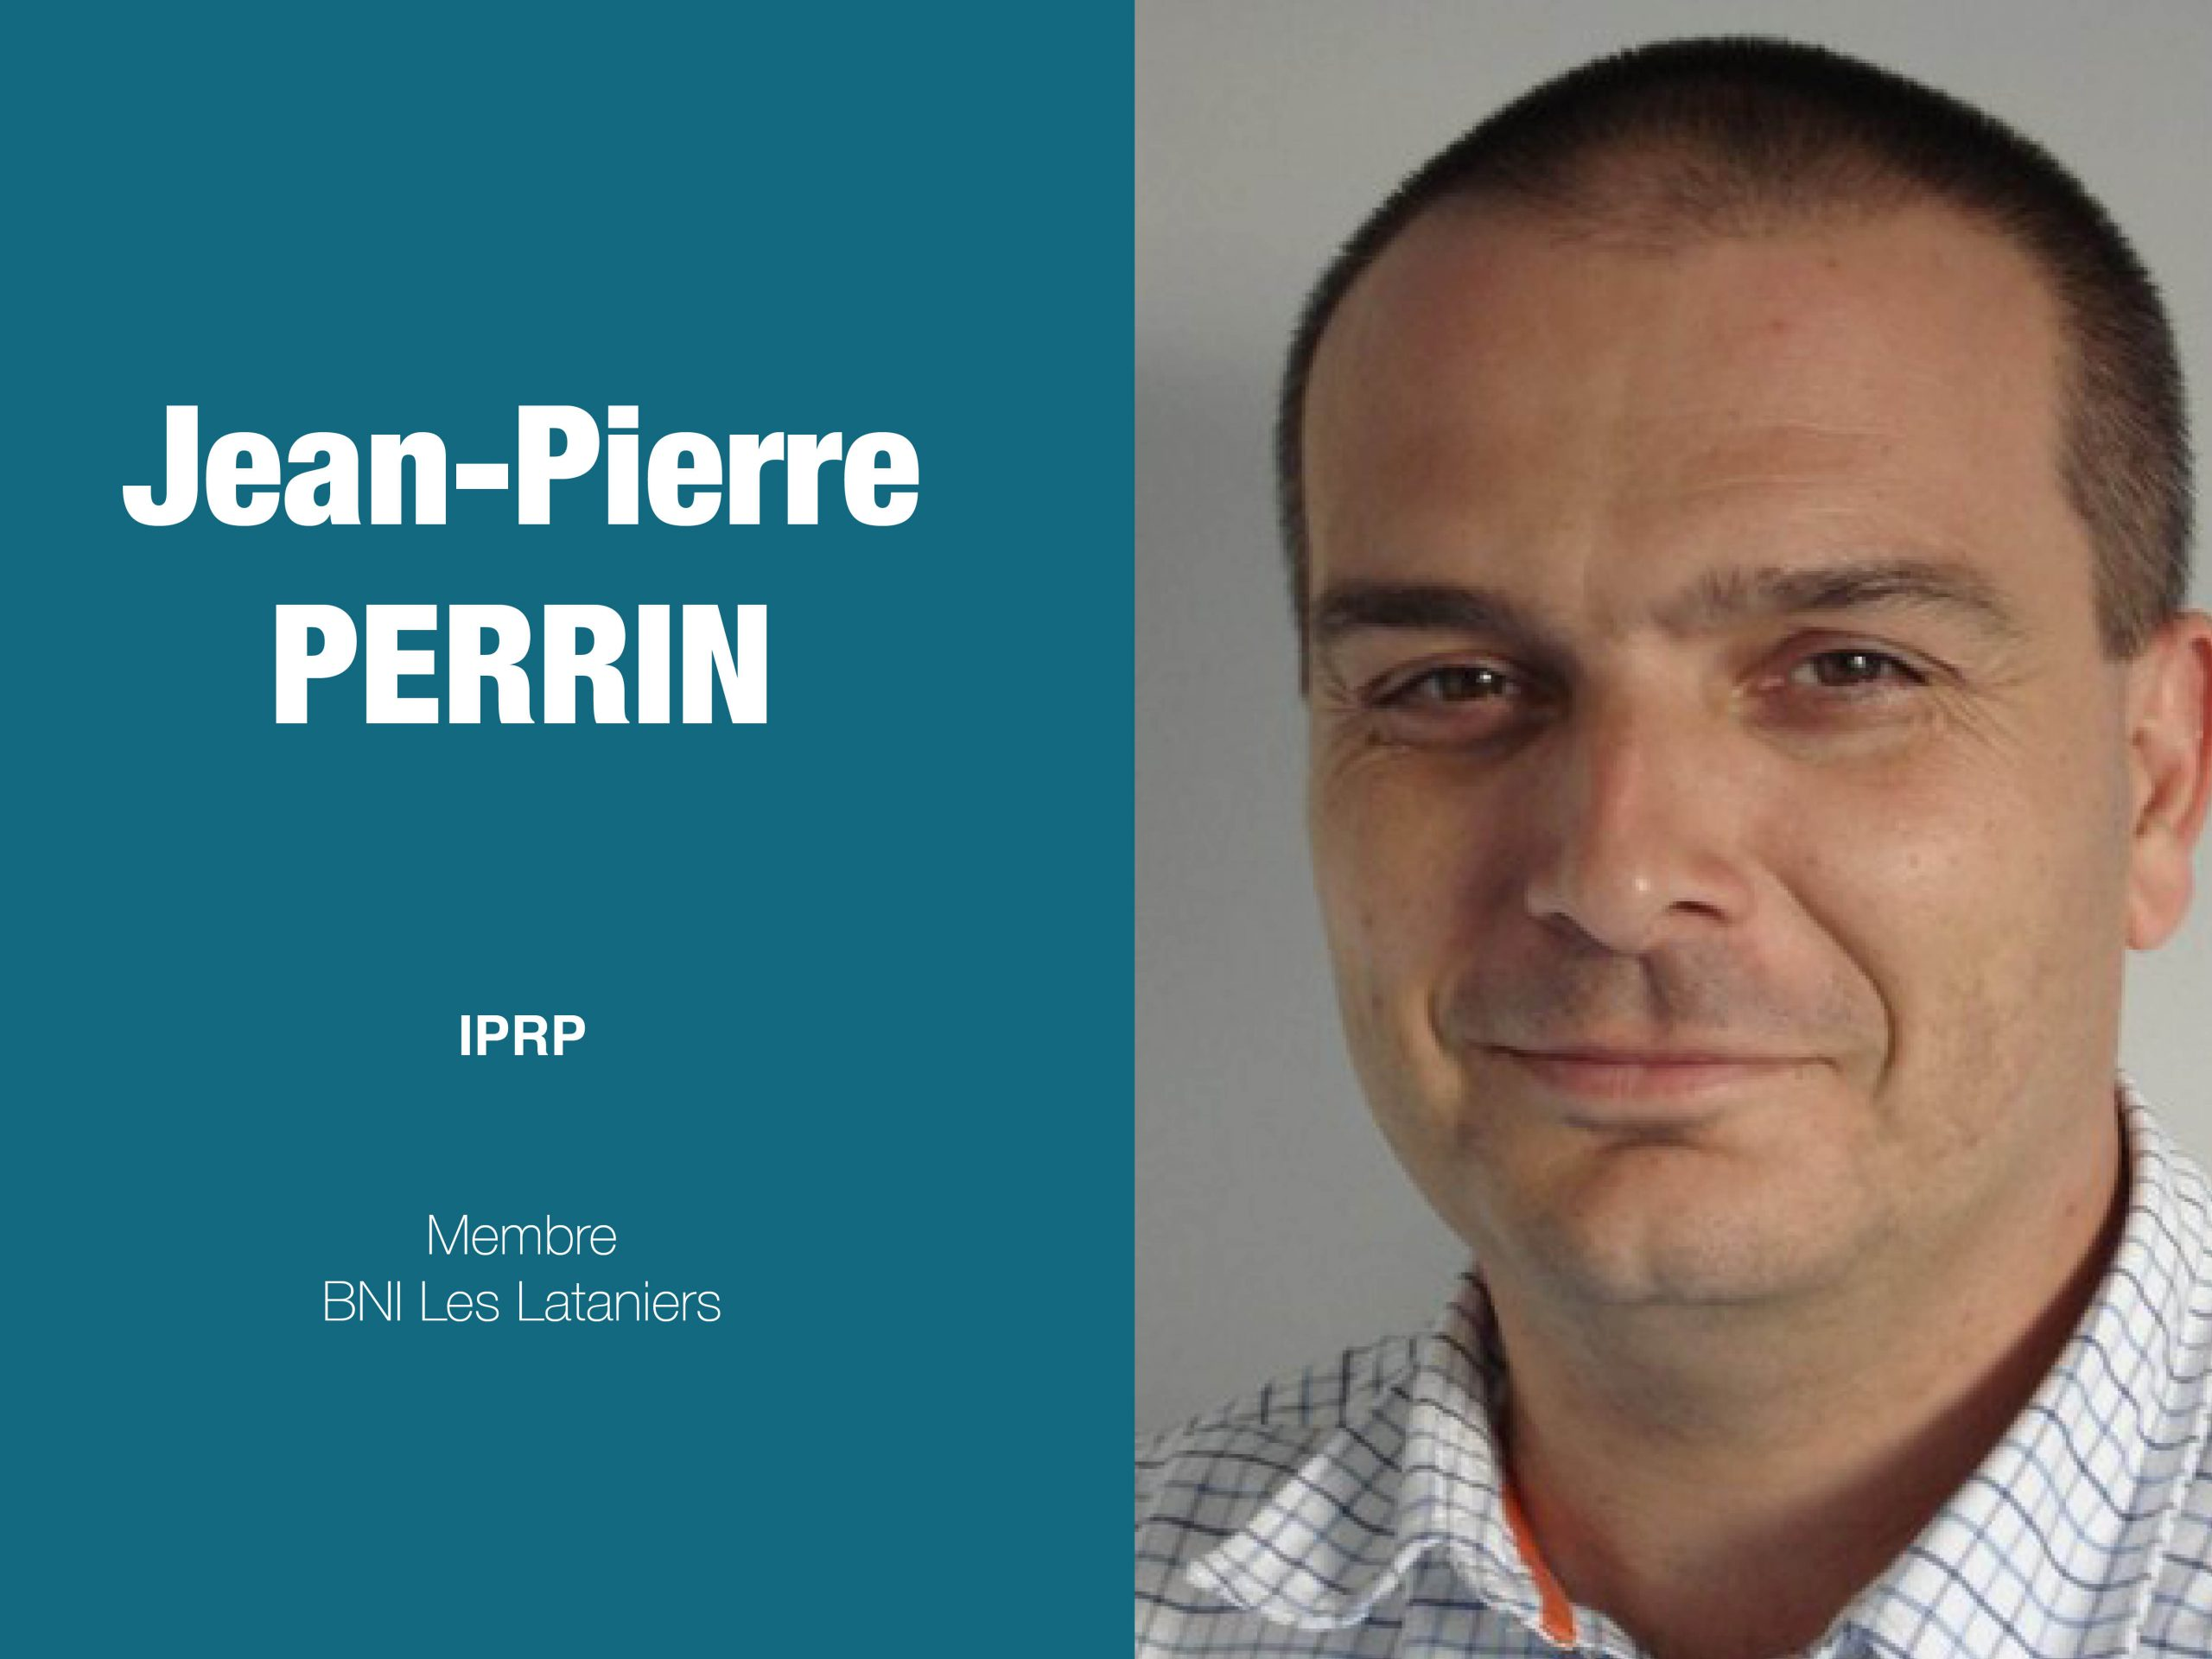 Jean-Pierre_Perrin_bni-les-lataniers.jpg